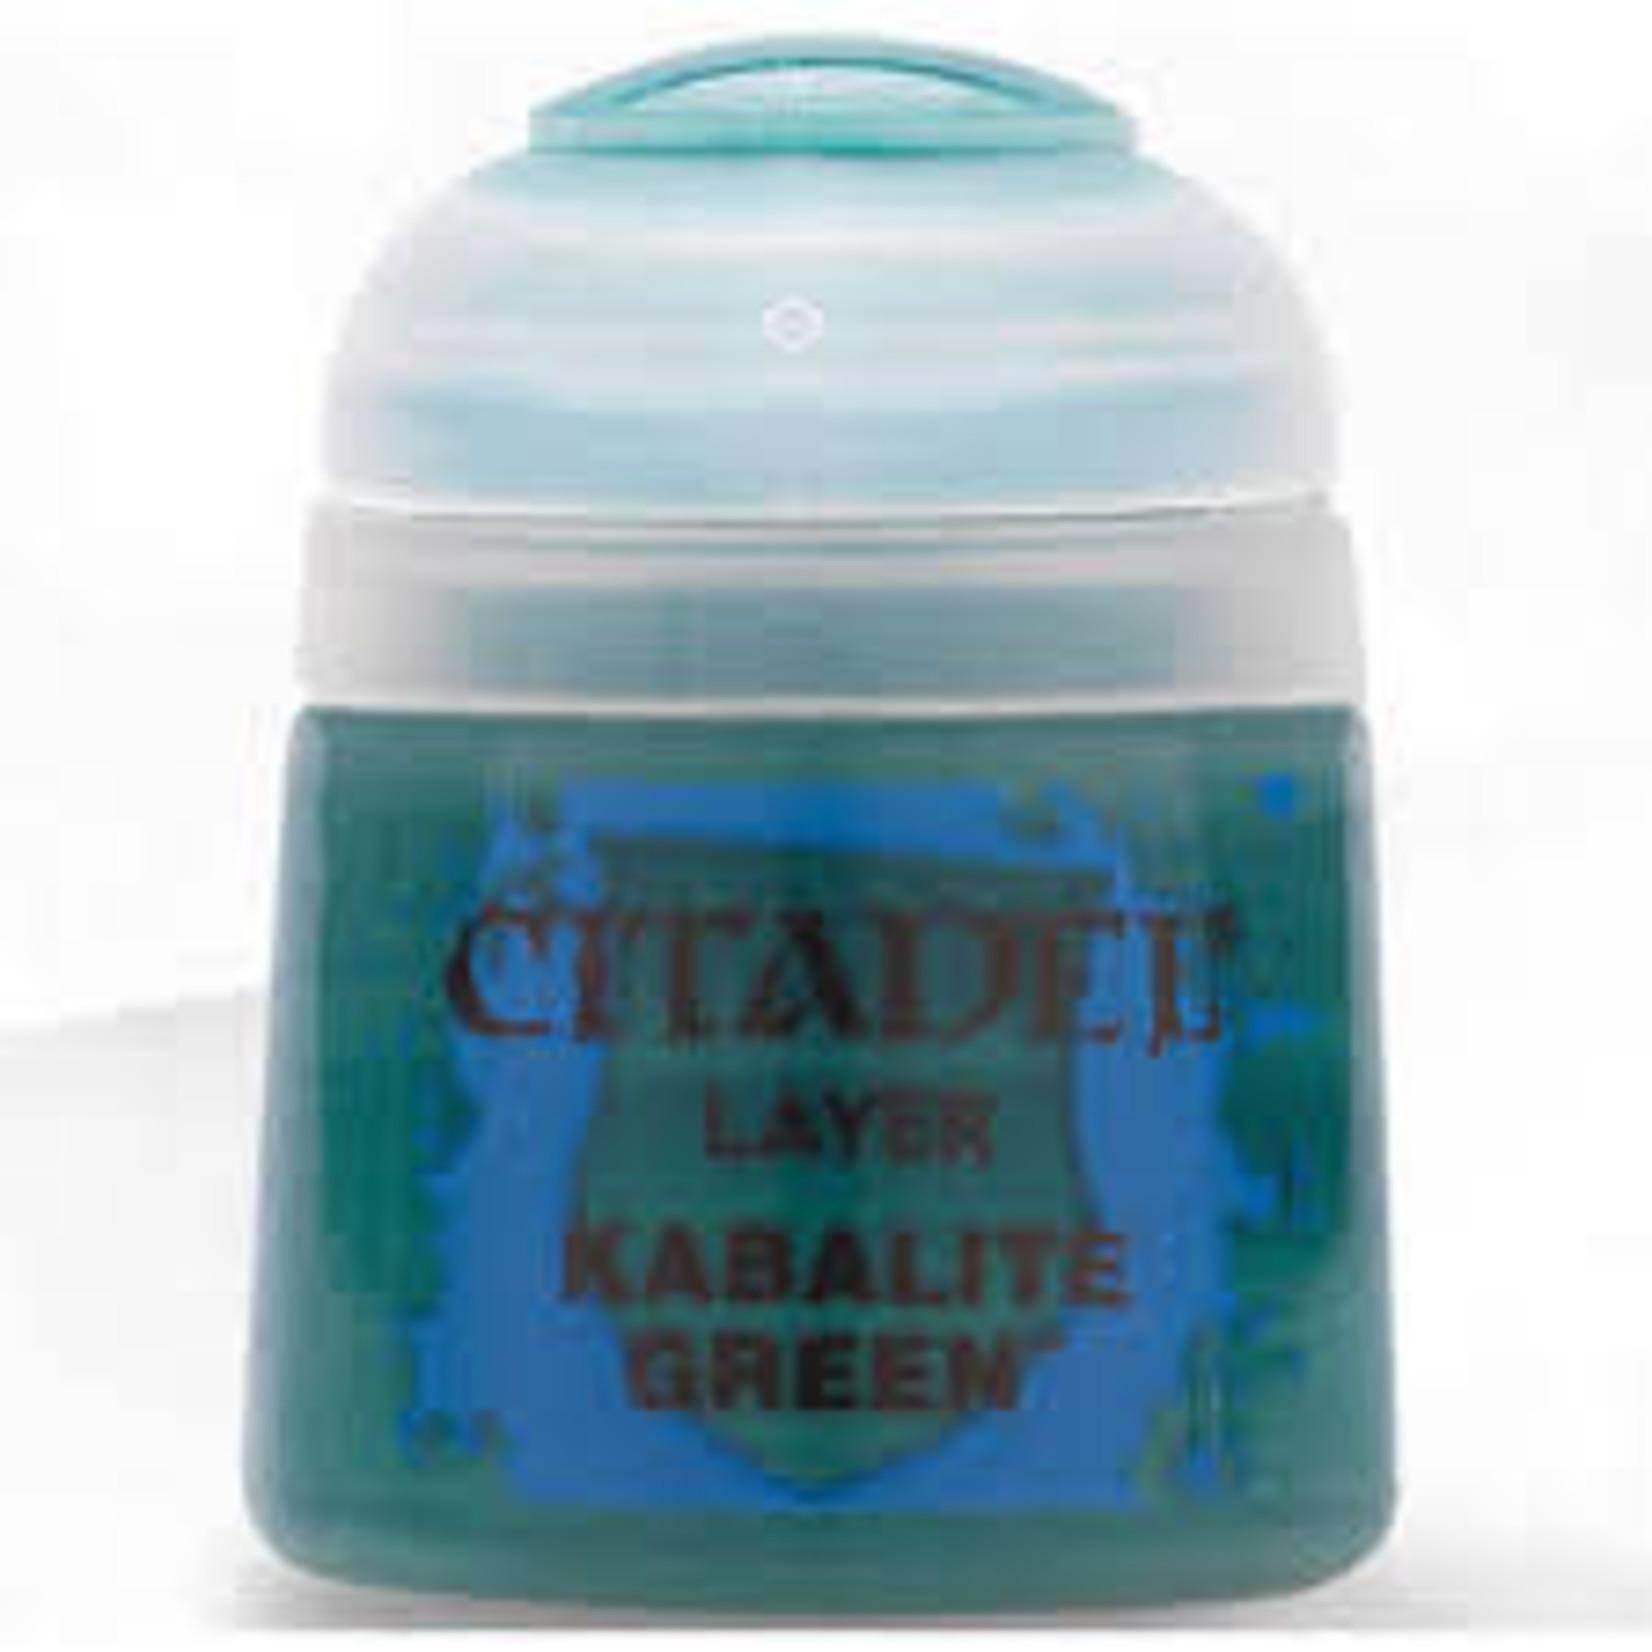 Games Workshop Citadel Paint: Kabalite Green 12ml